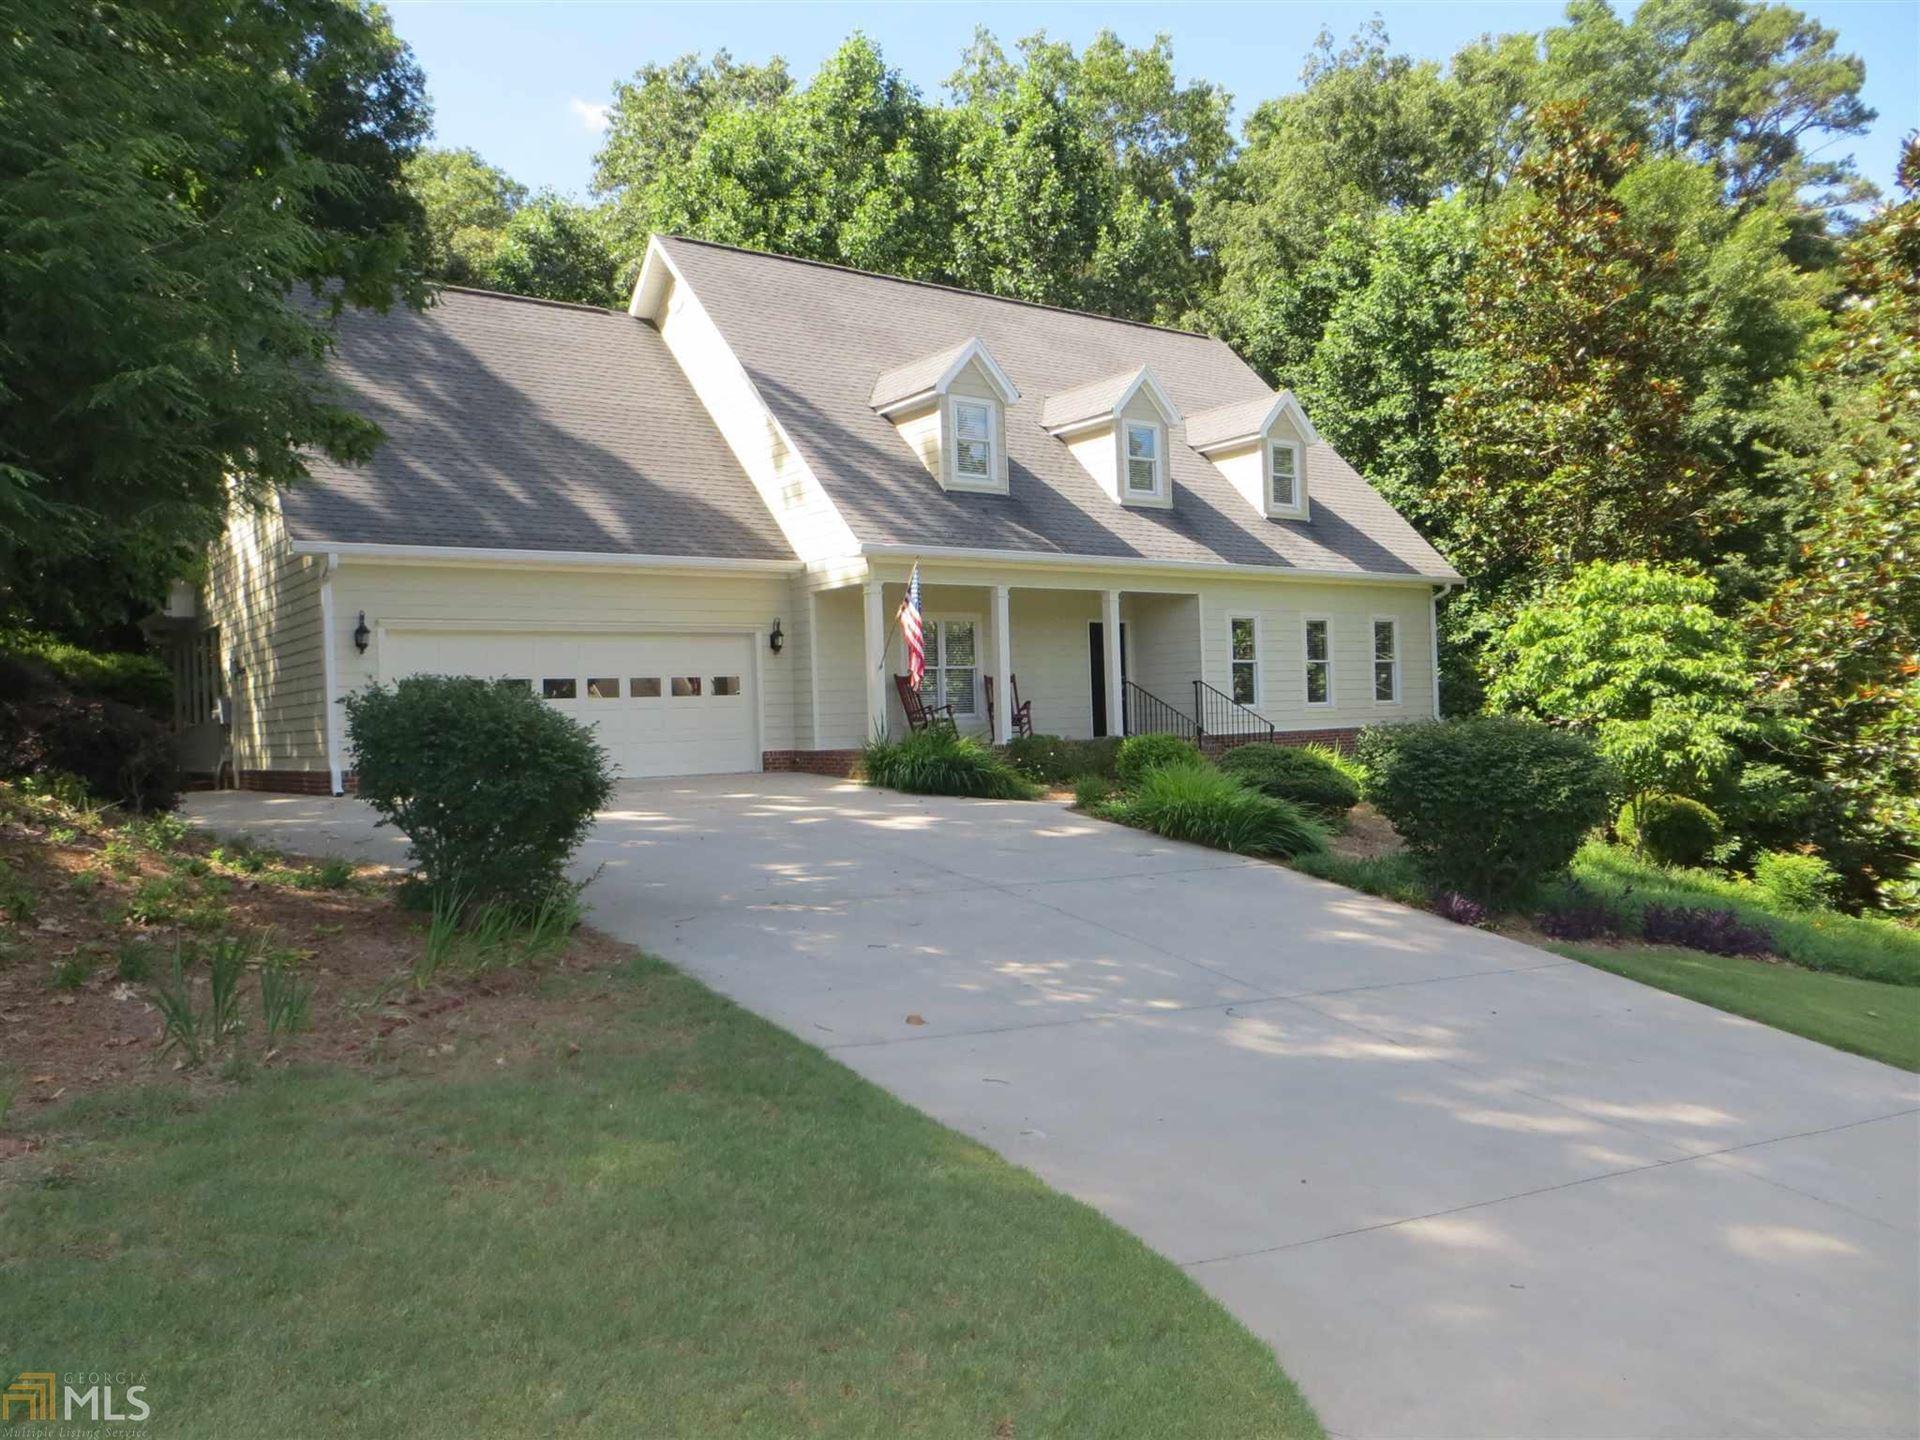 3635 Hanover Dr, Gainesville, GA 30506 - #: 8815446